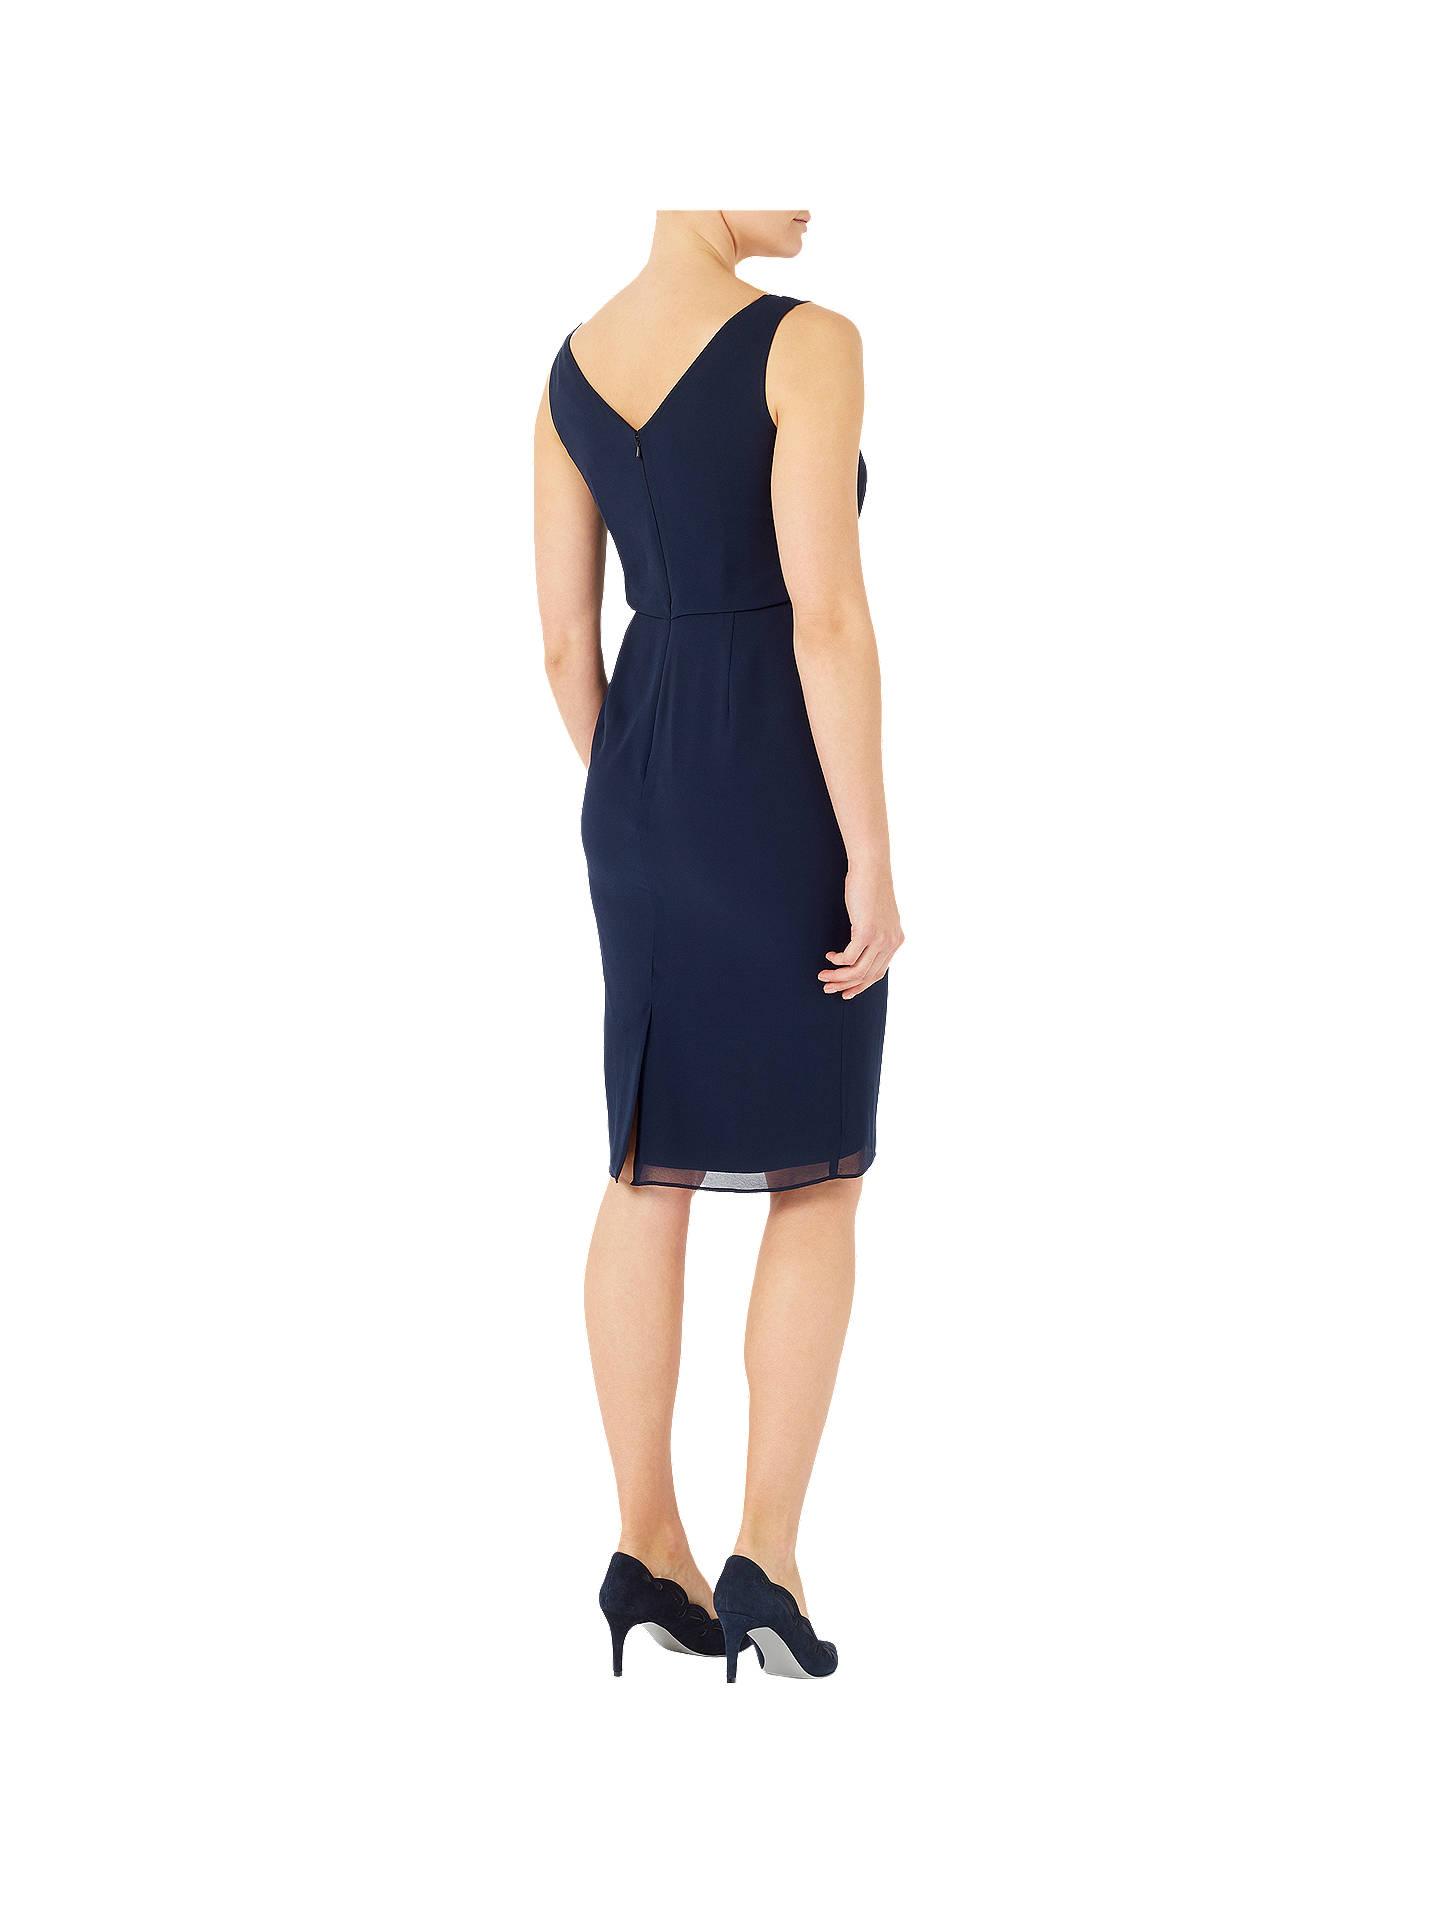 a7b5886a01975 ... Buy Jacques Vert Chiffon Lace Trim Dress